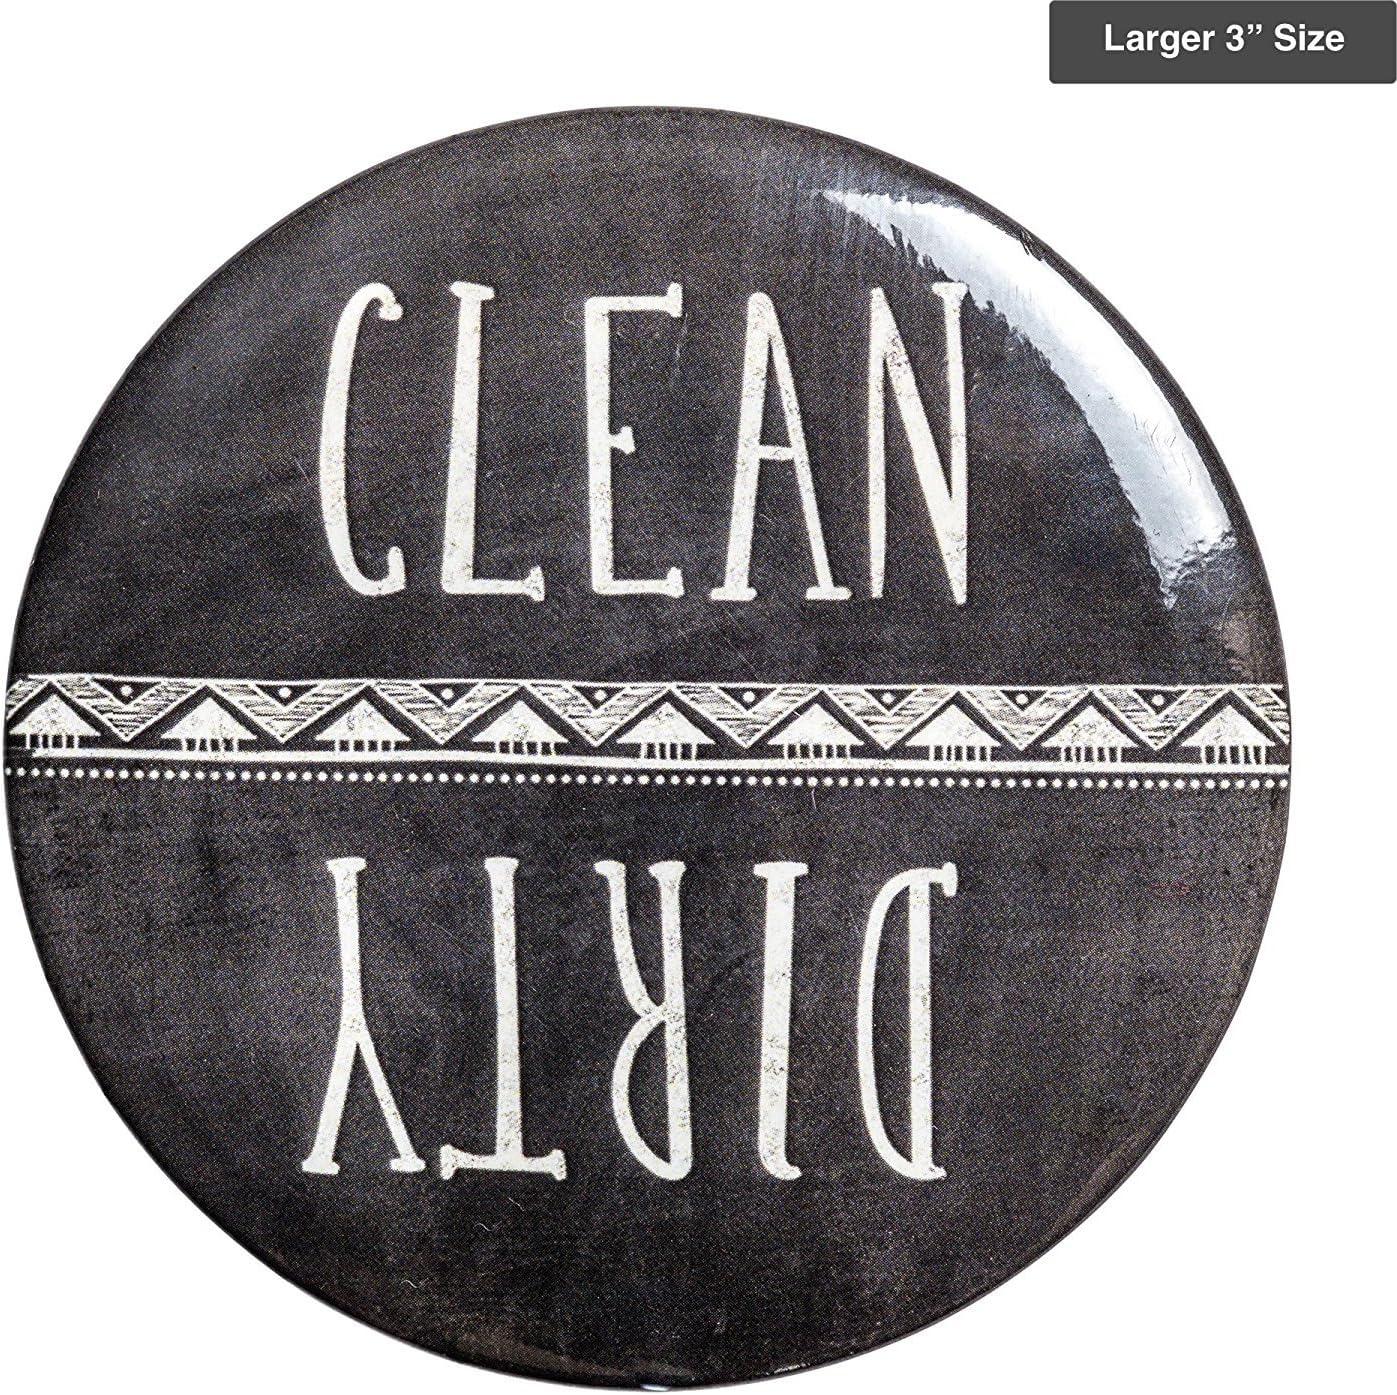 "Sutter Signs Clean & Dirty Dishwasher Magnet (Chalkboard) Large 3"""